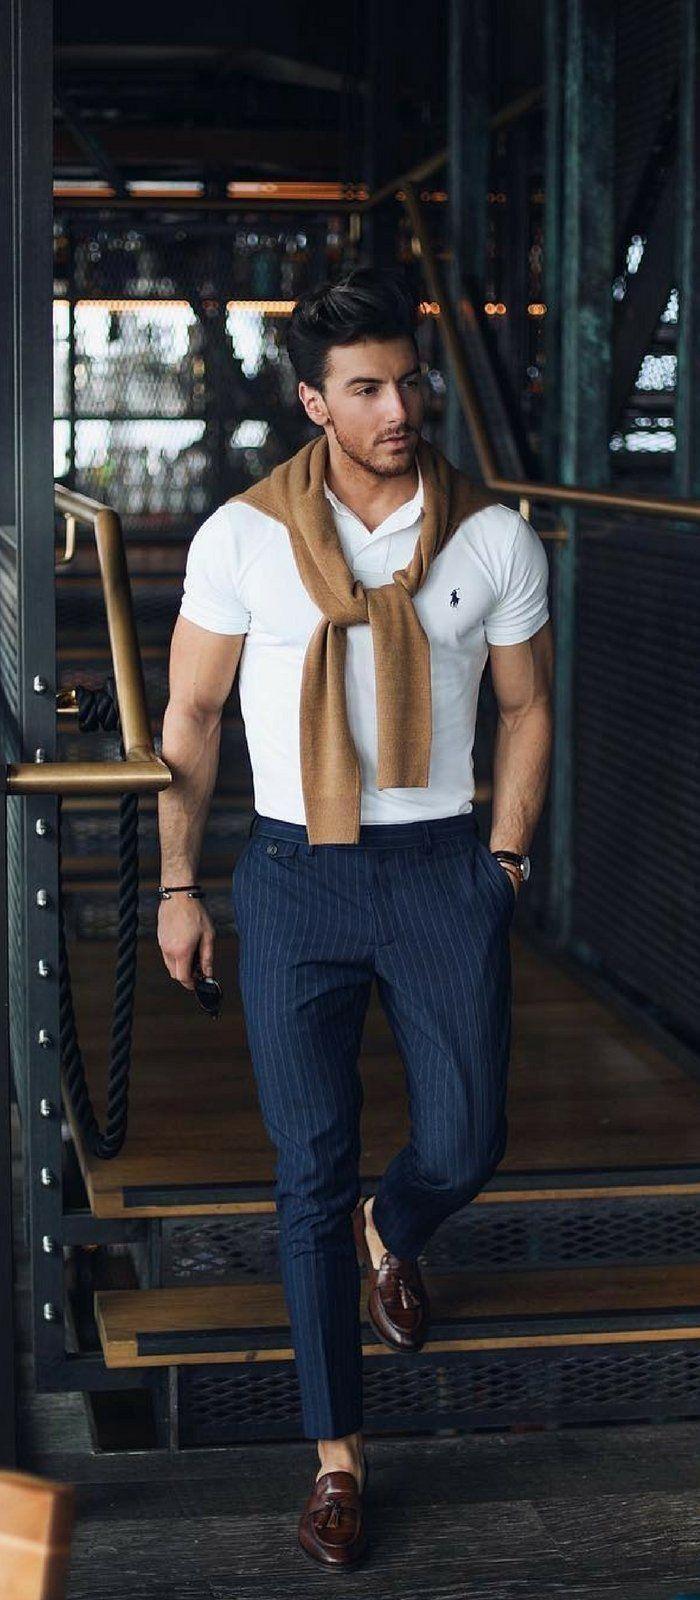 Nice style | Herren klamotten, Männliche mode, Männer mode